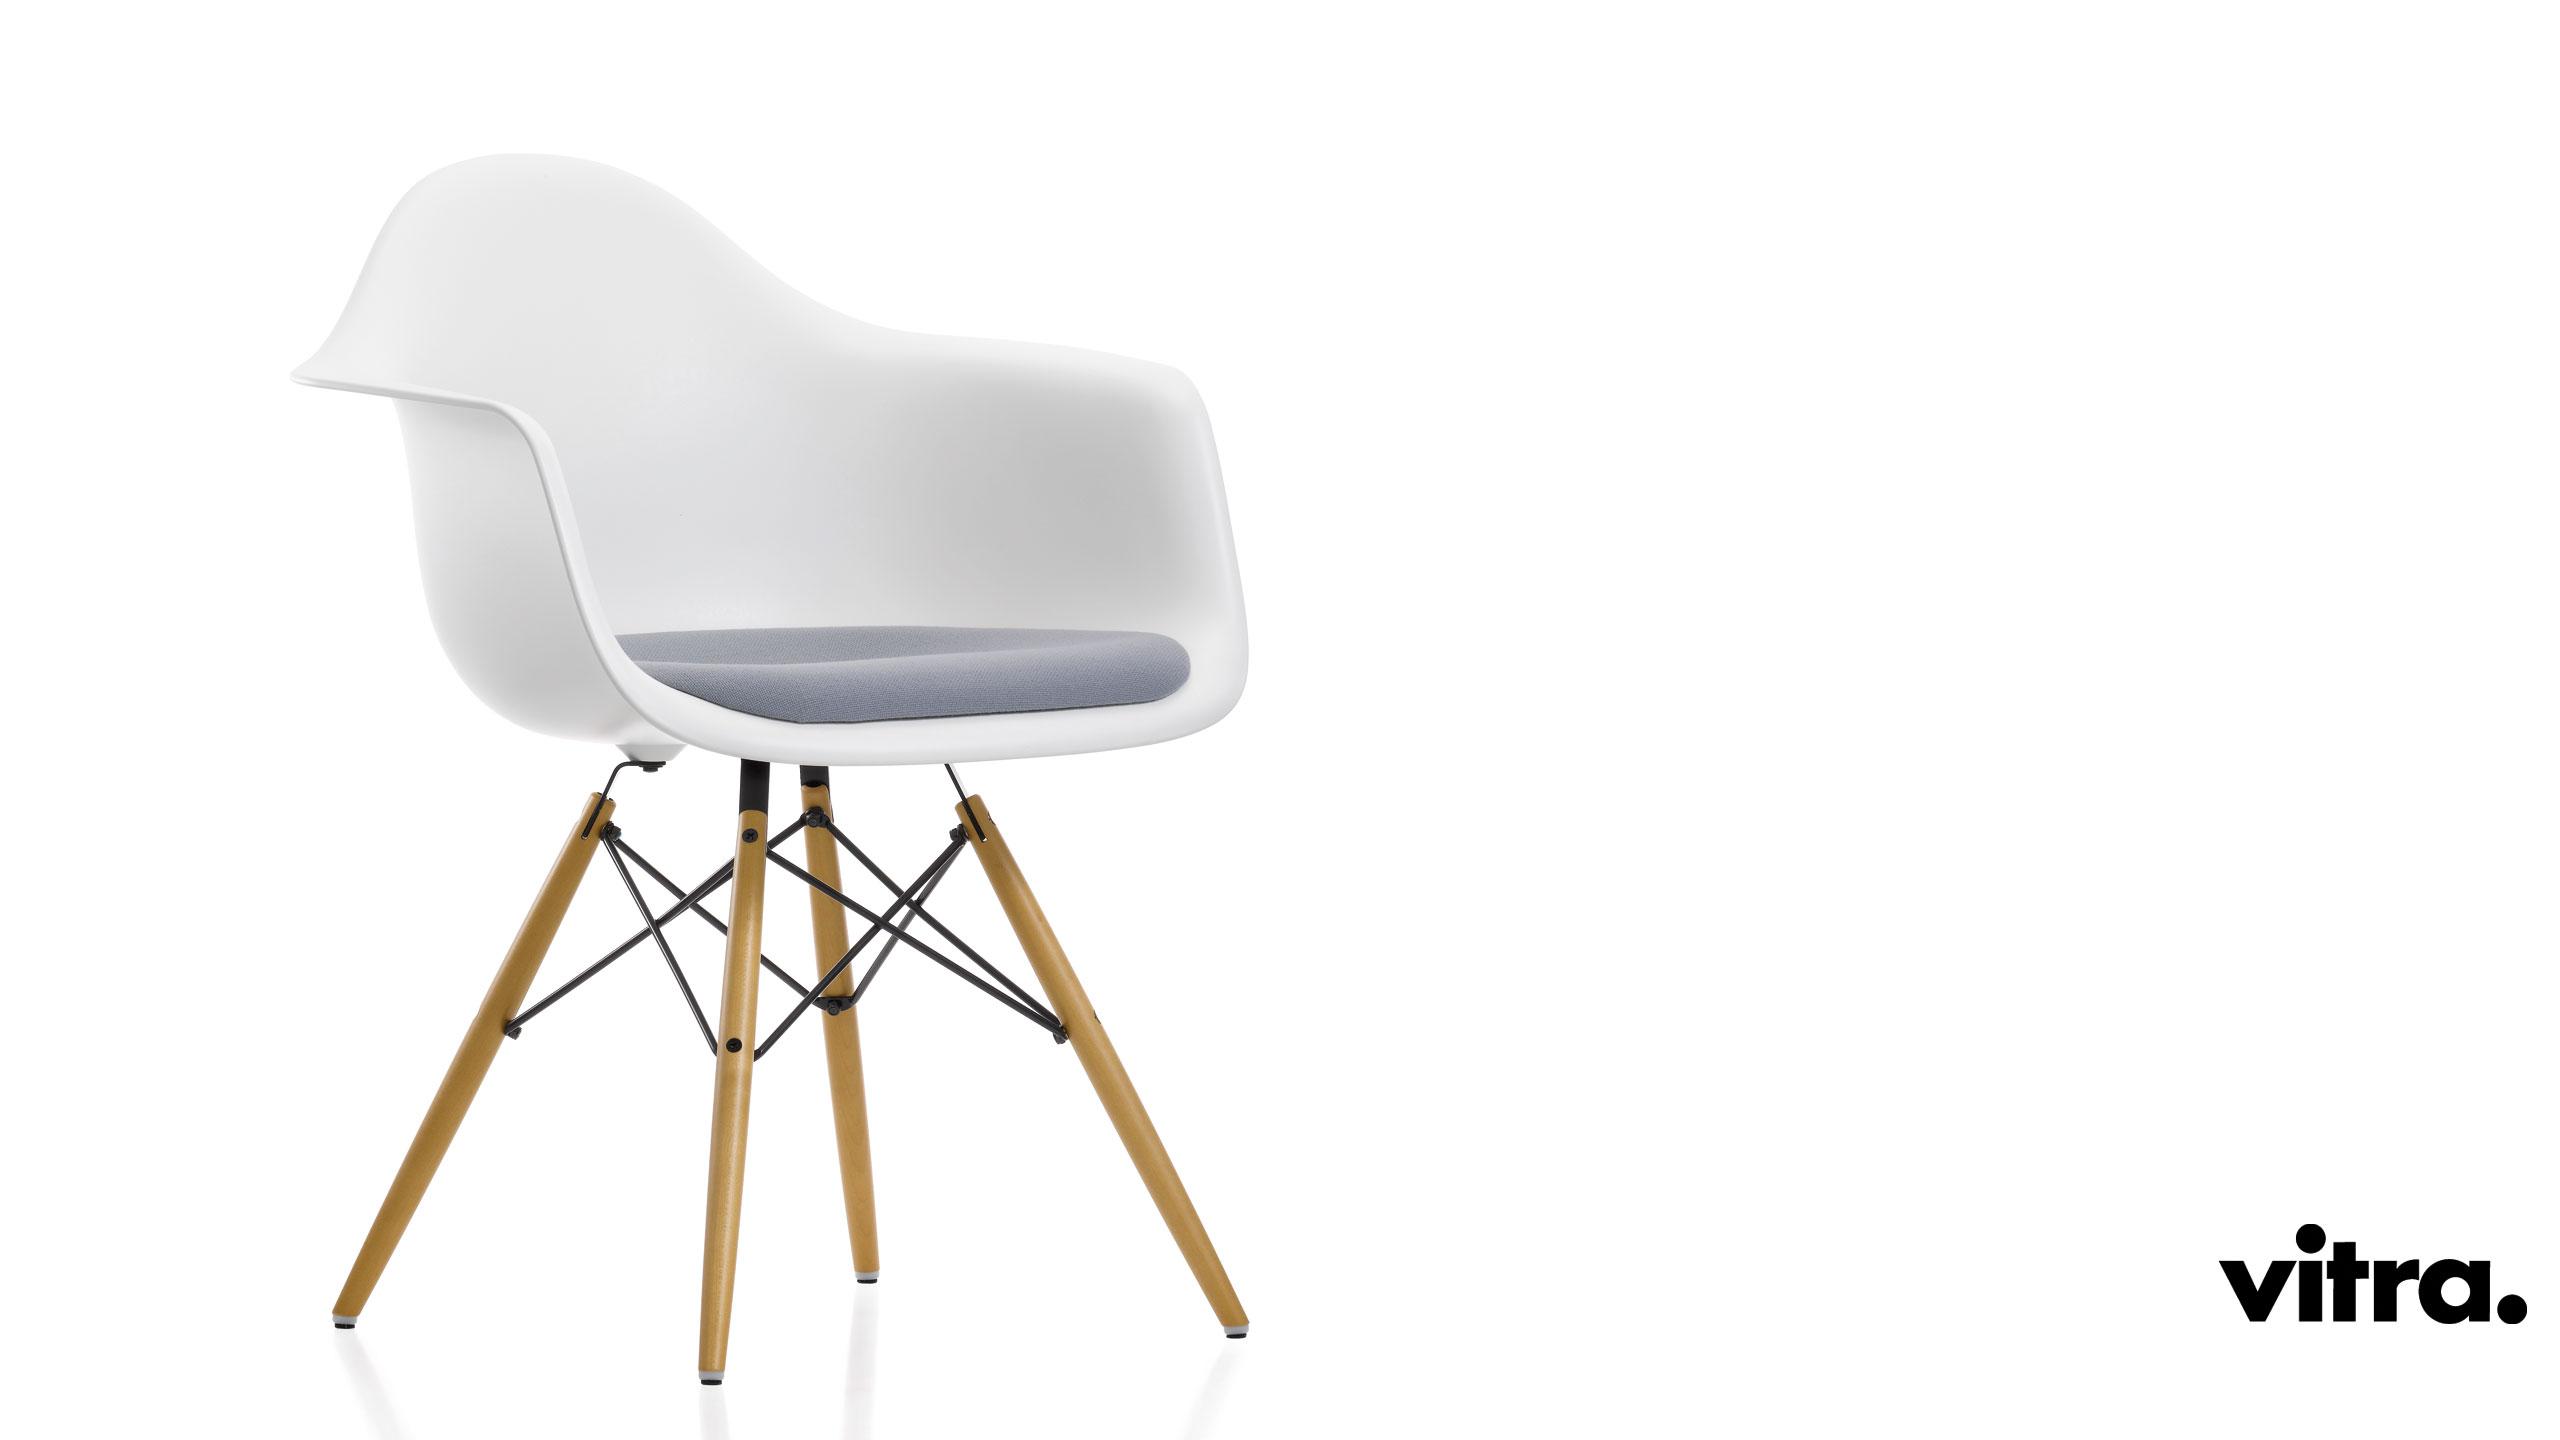 vitra plastic armchair daw m bel braum. Black Bedroom Furniture Sets. Home Design Ideas